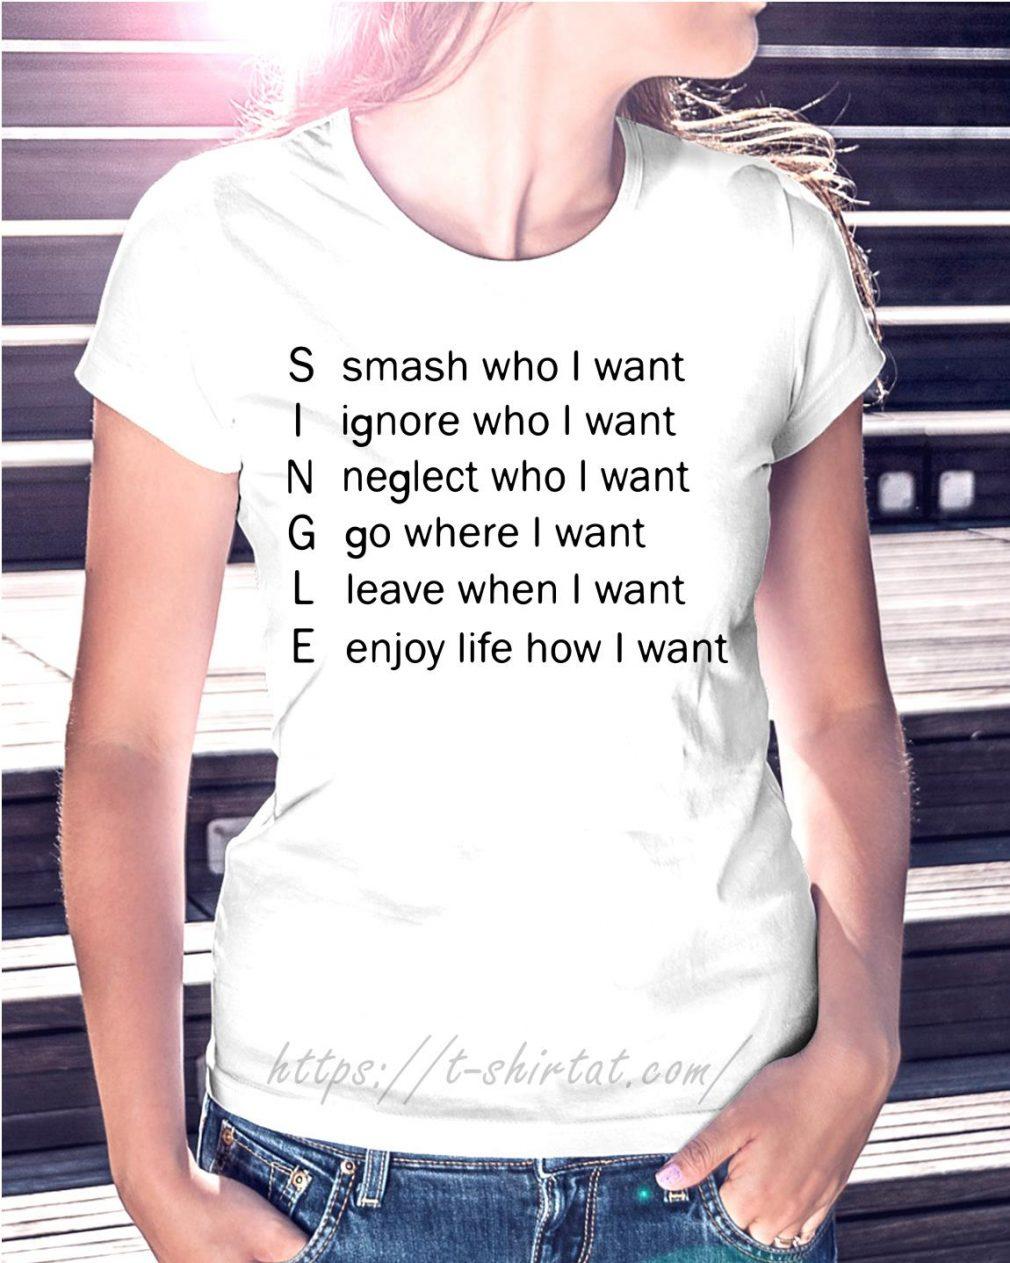 Single smash who I want ignore who I want neglect who I want